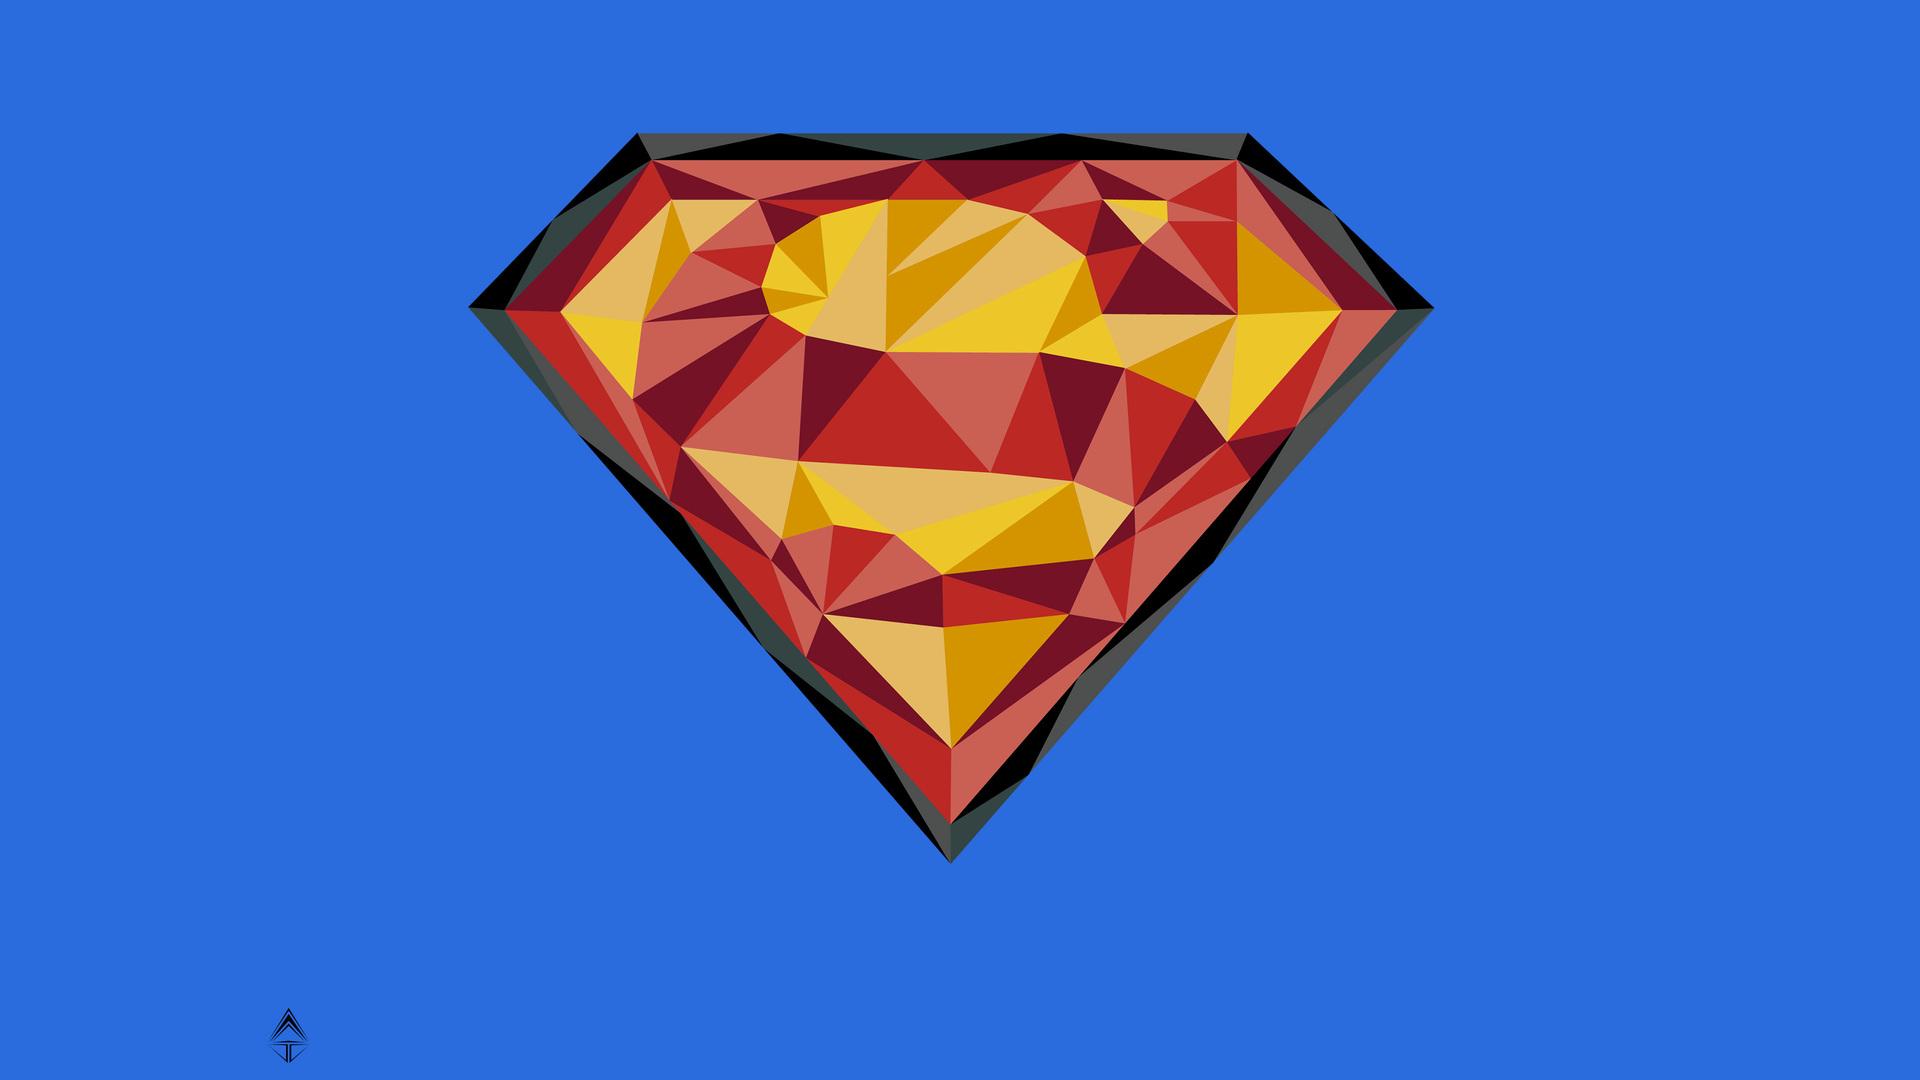 1920x1080 superman logo 4k art laptop full hd 1080p hd 4k wallpapers superman logo 4k art gdg voltagebd Choice Image